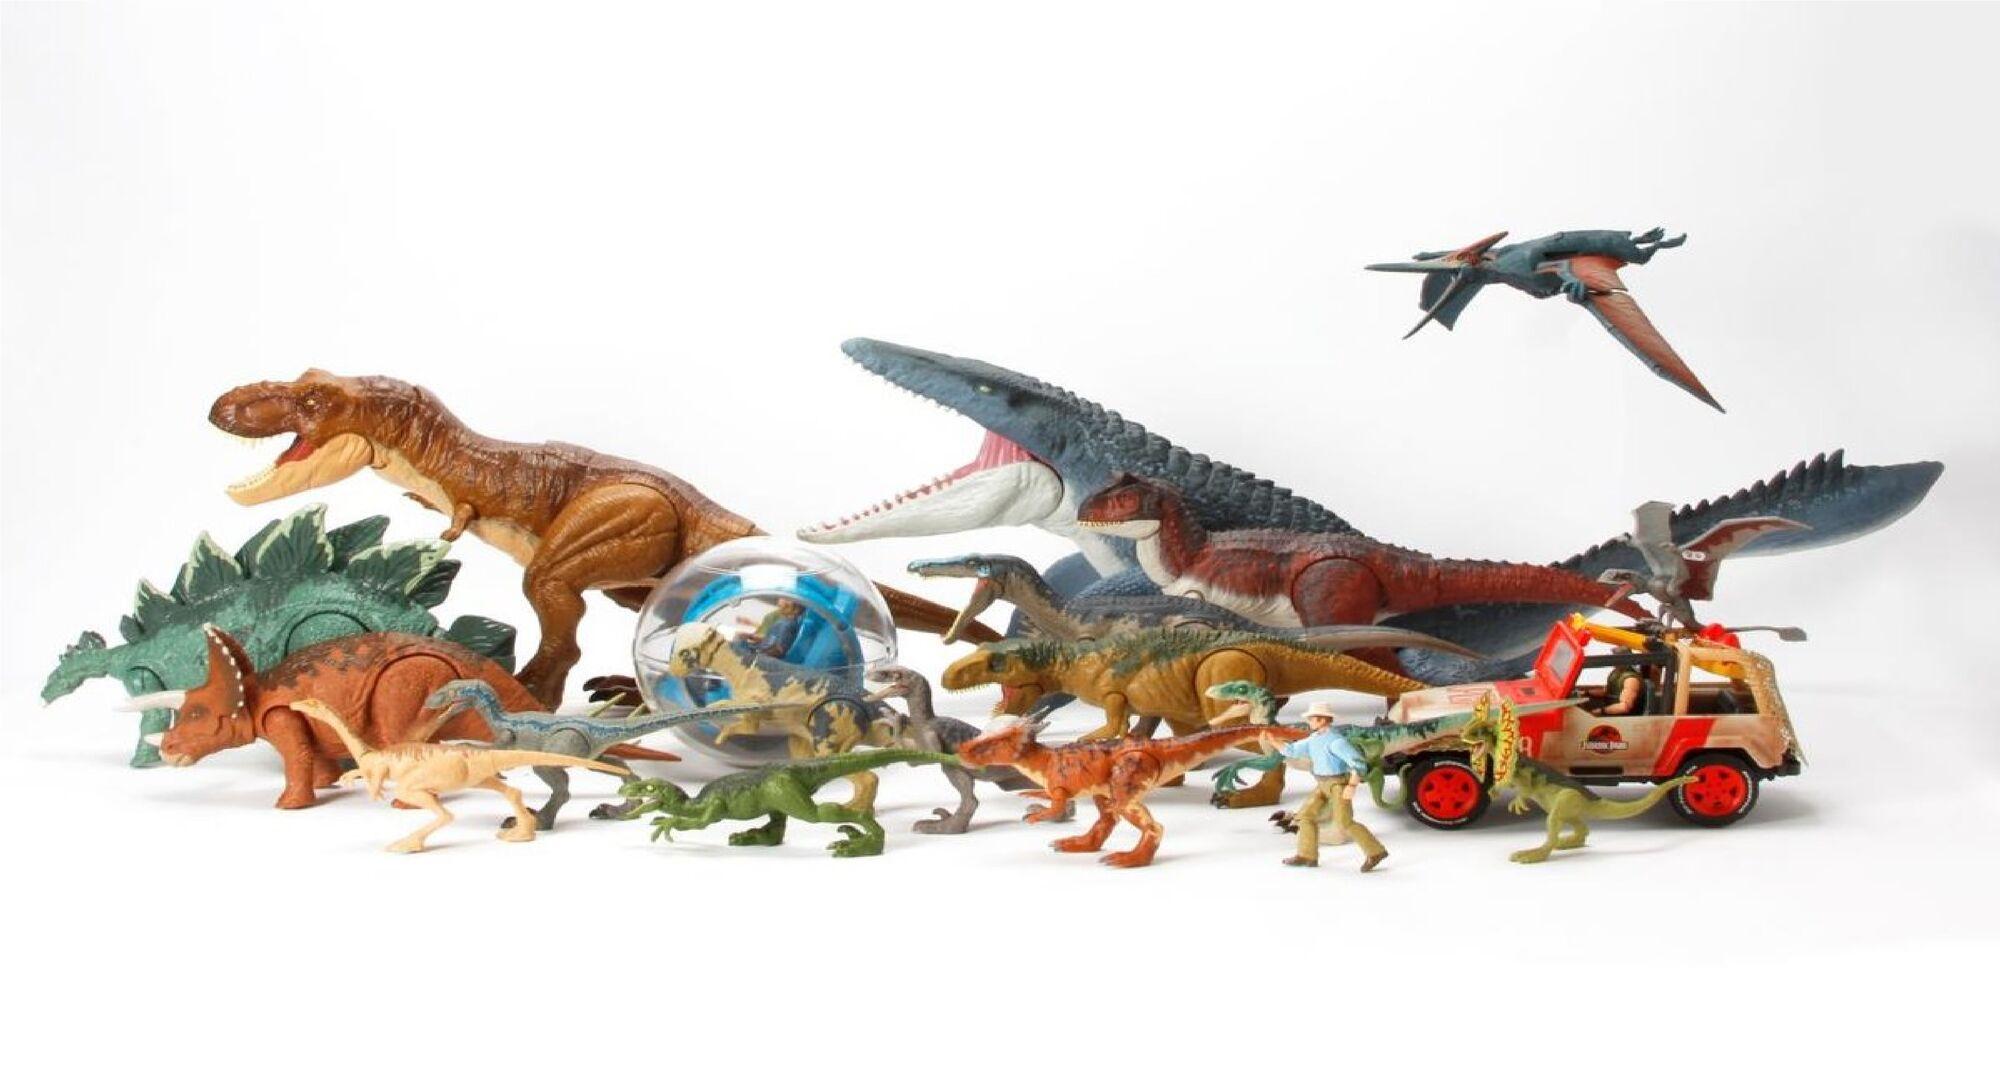 Jurassic World: Fallen Kingdom toys | Jurassic Park wiki